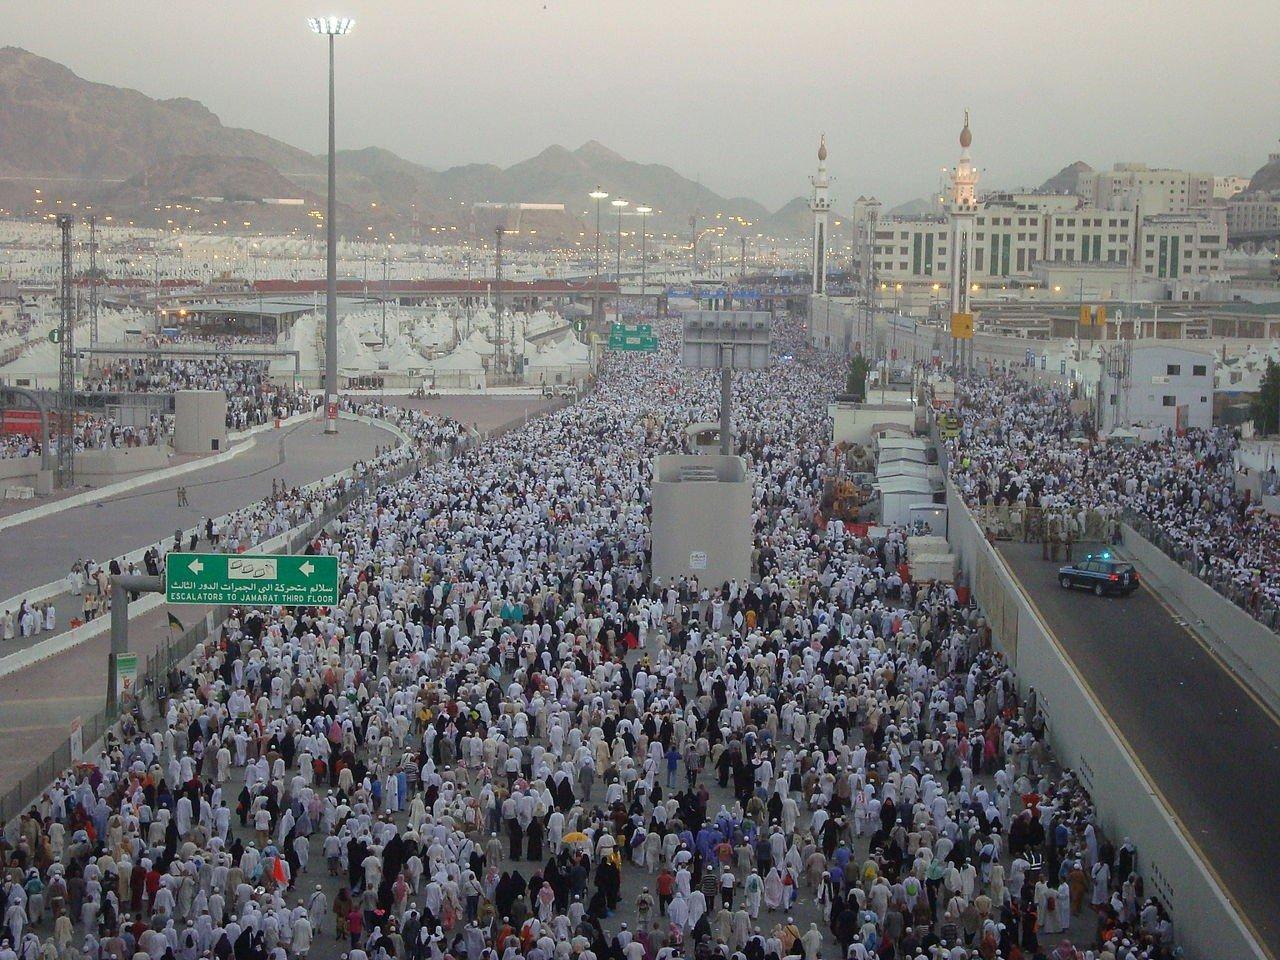 Jamarat Bridge Mina Makkah Madinah Saudi Arabia